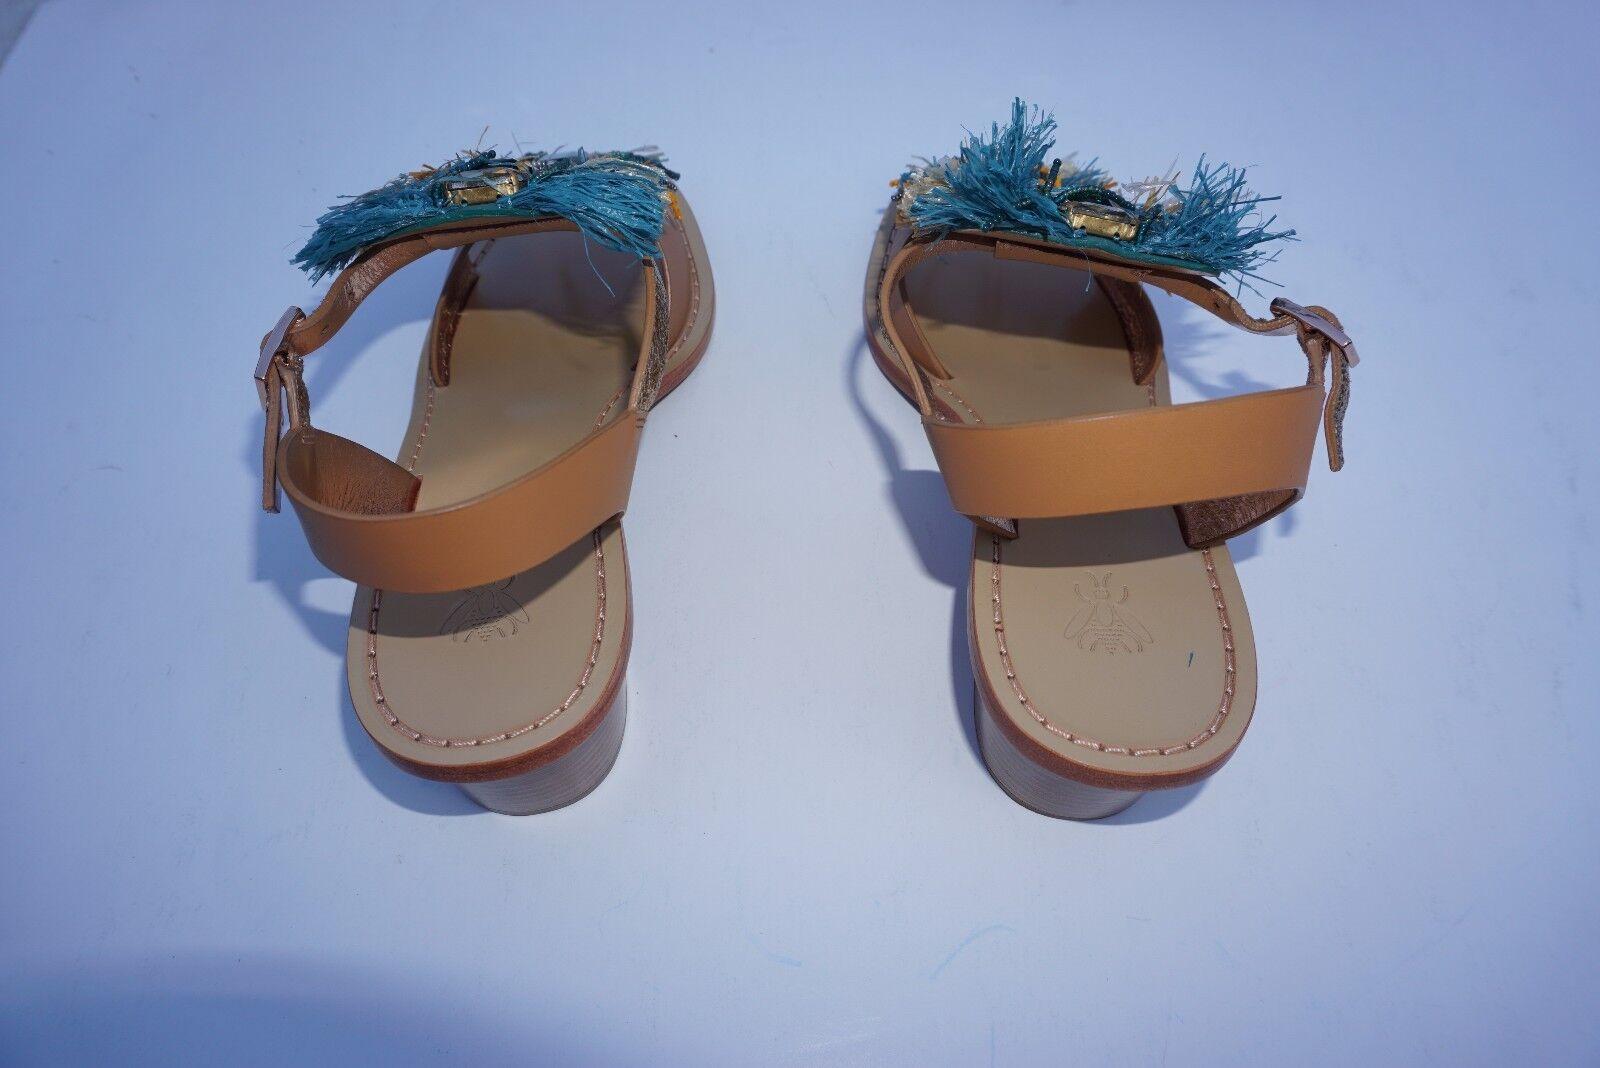 Anthropologie Sanchita Dilochia Dilochia Dilochia Slingback Sandals 39/US 8.5 fringe & beads NWB 5cd680